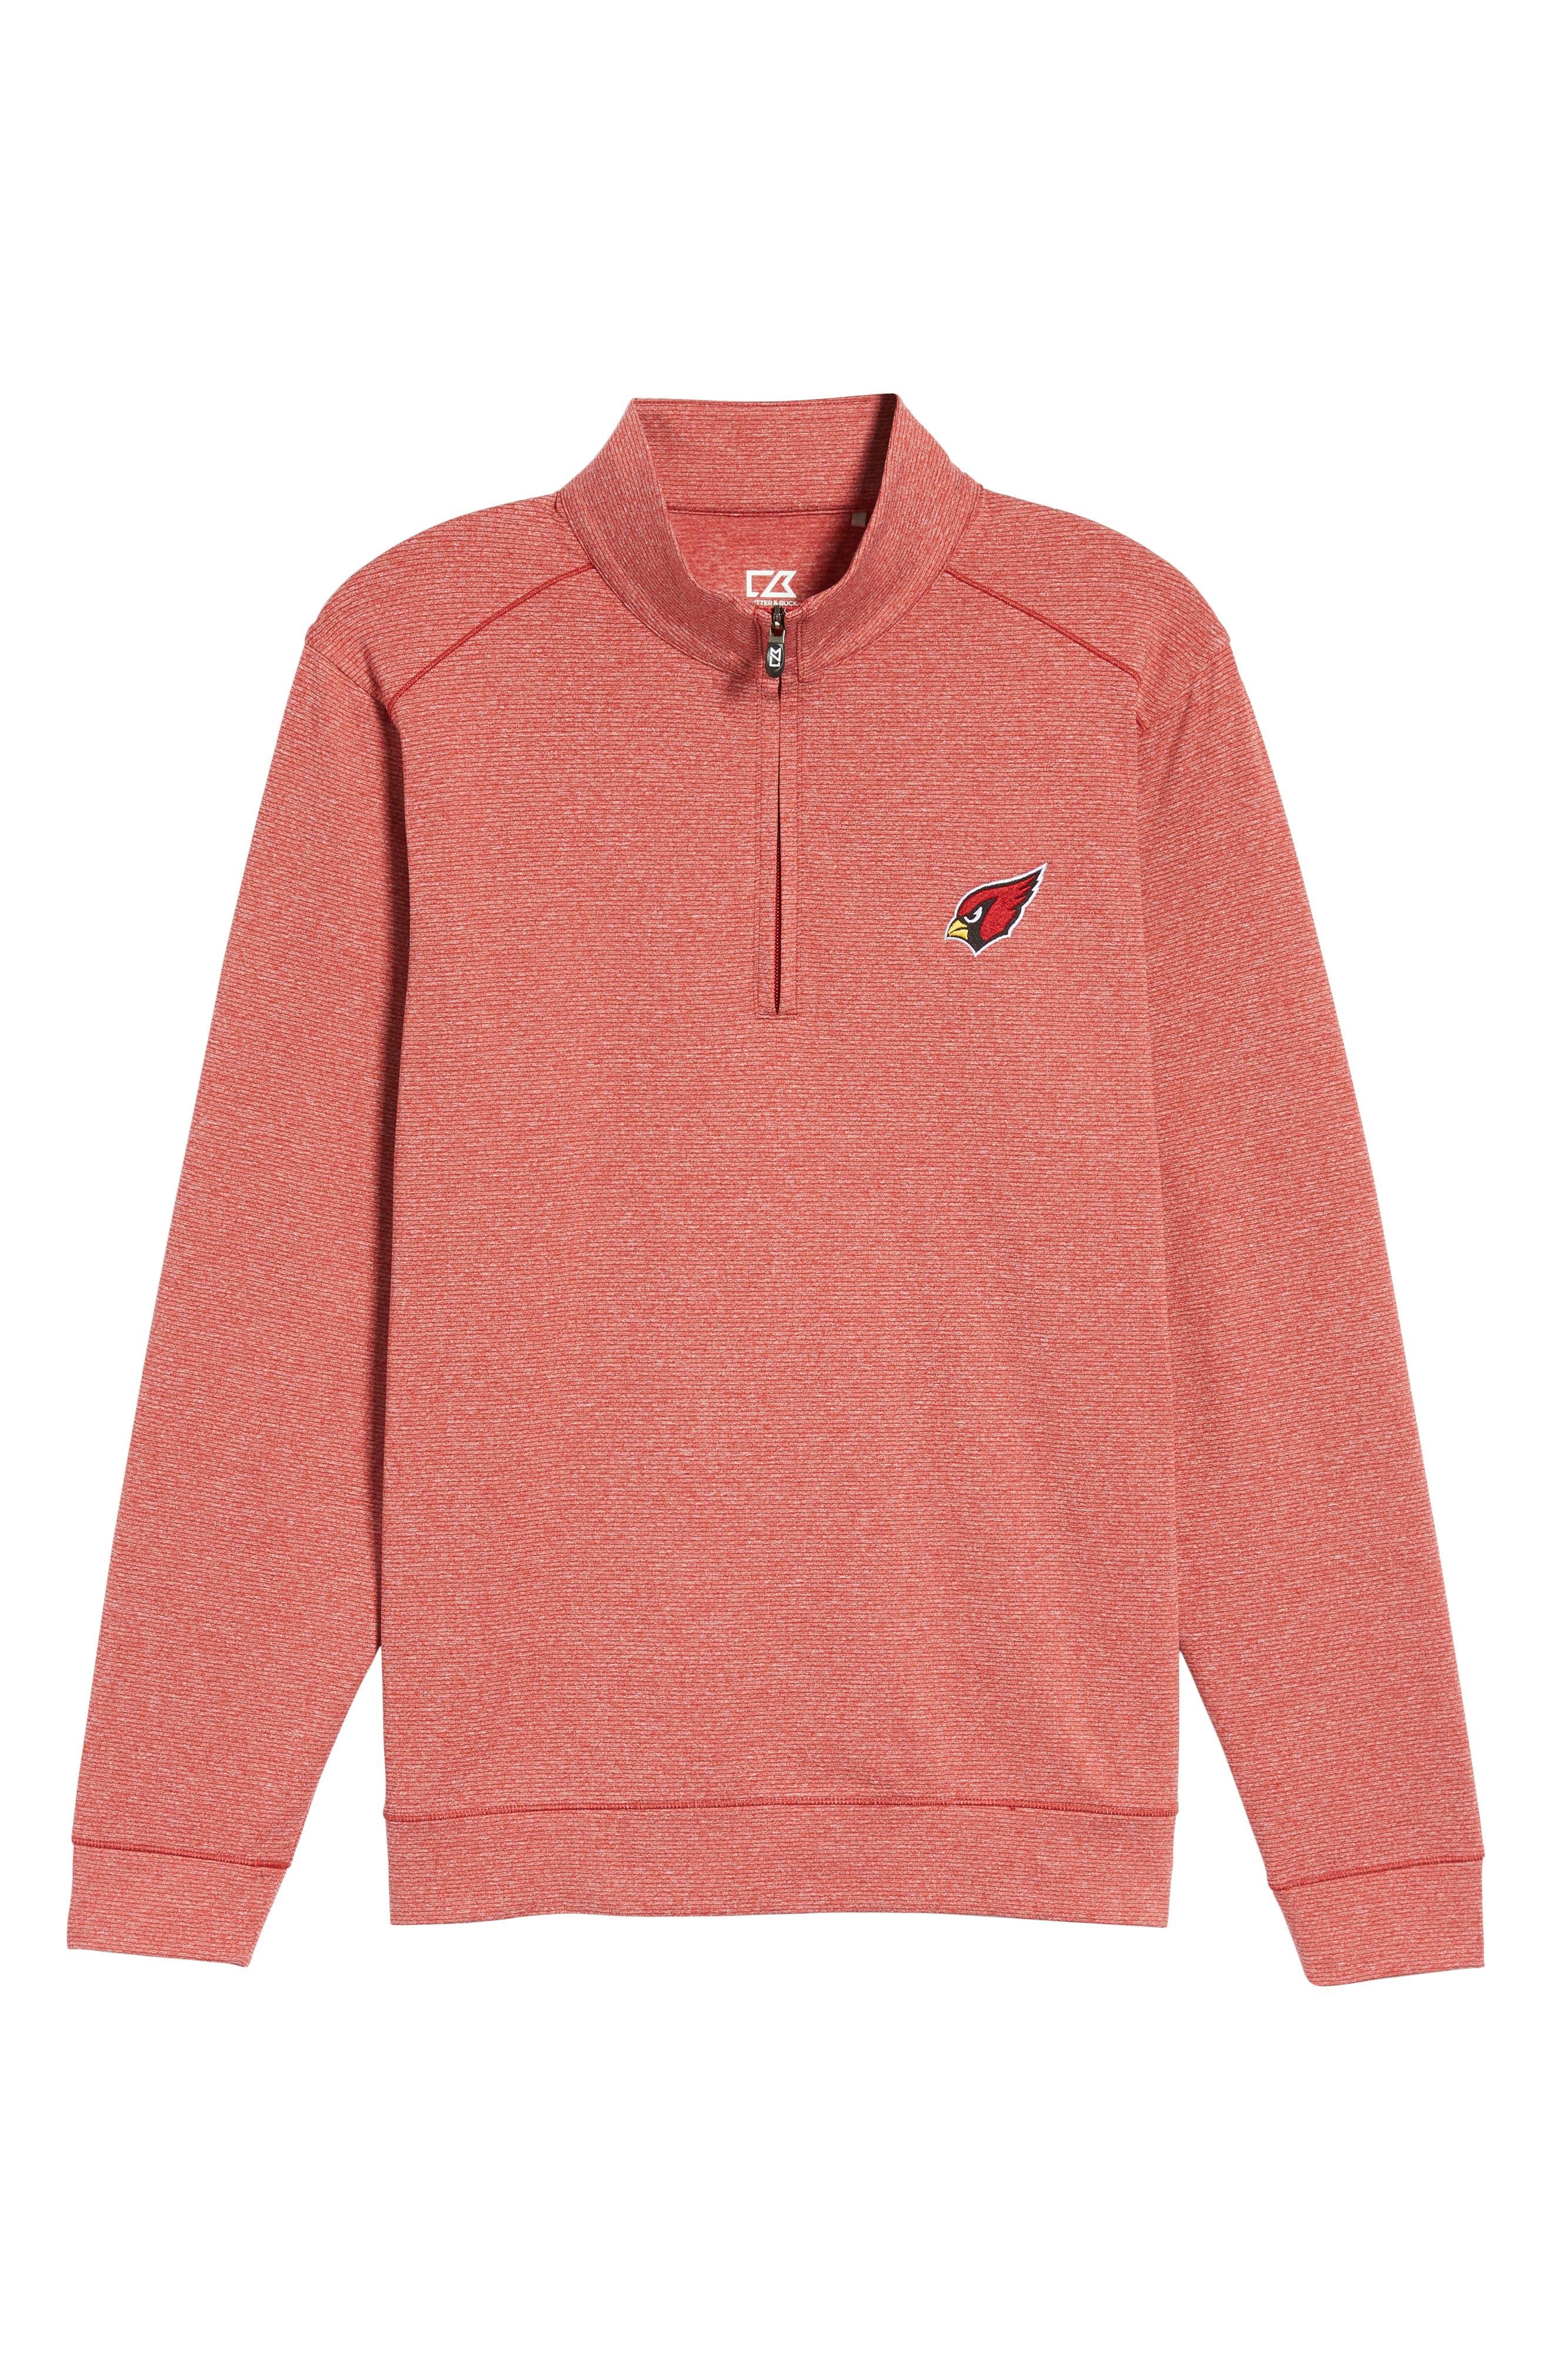 Shoreline - Arizona Cardinals Half Zip Pullover,                             Alternate thumbnail 6, color,